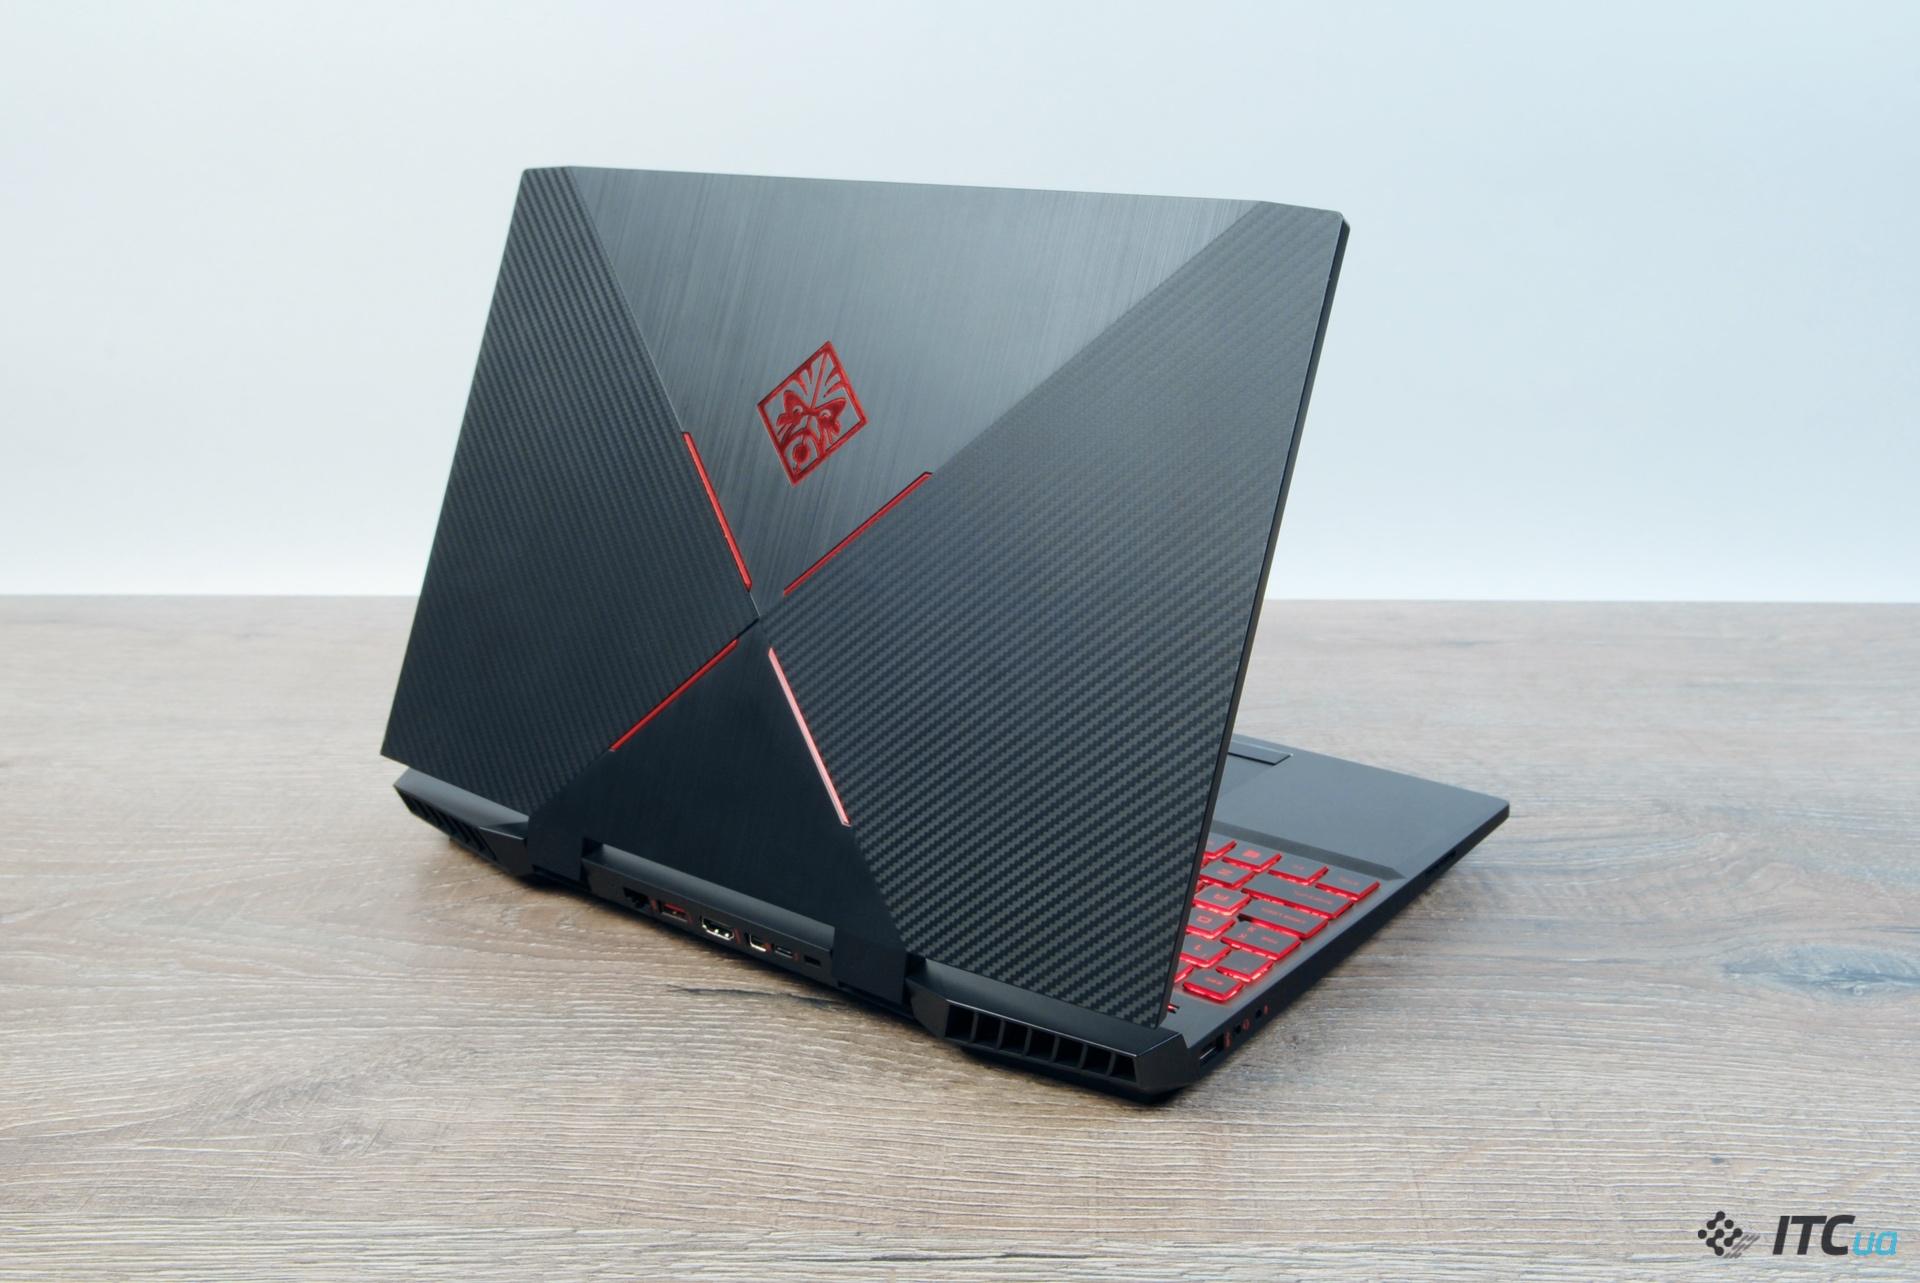 HP Omen 15 2018 Gaming Laptop review